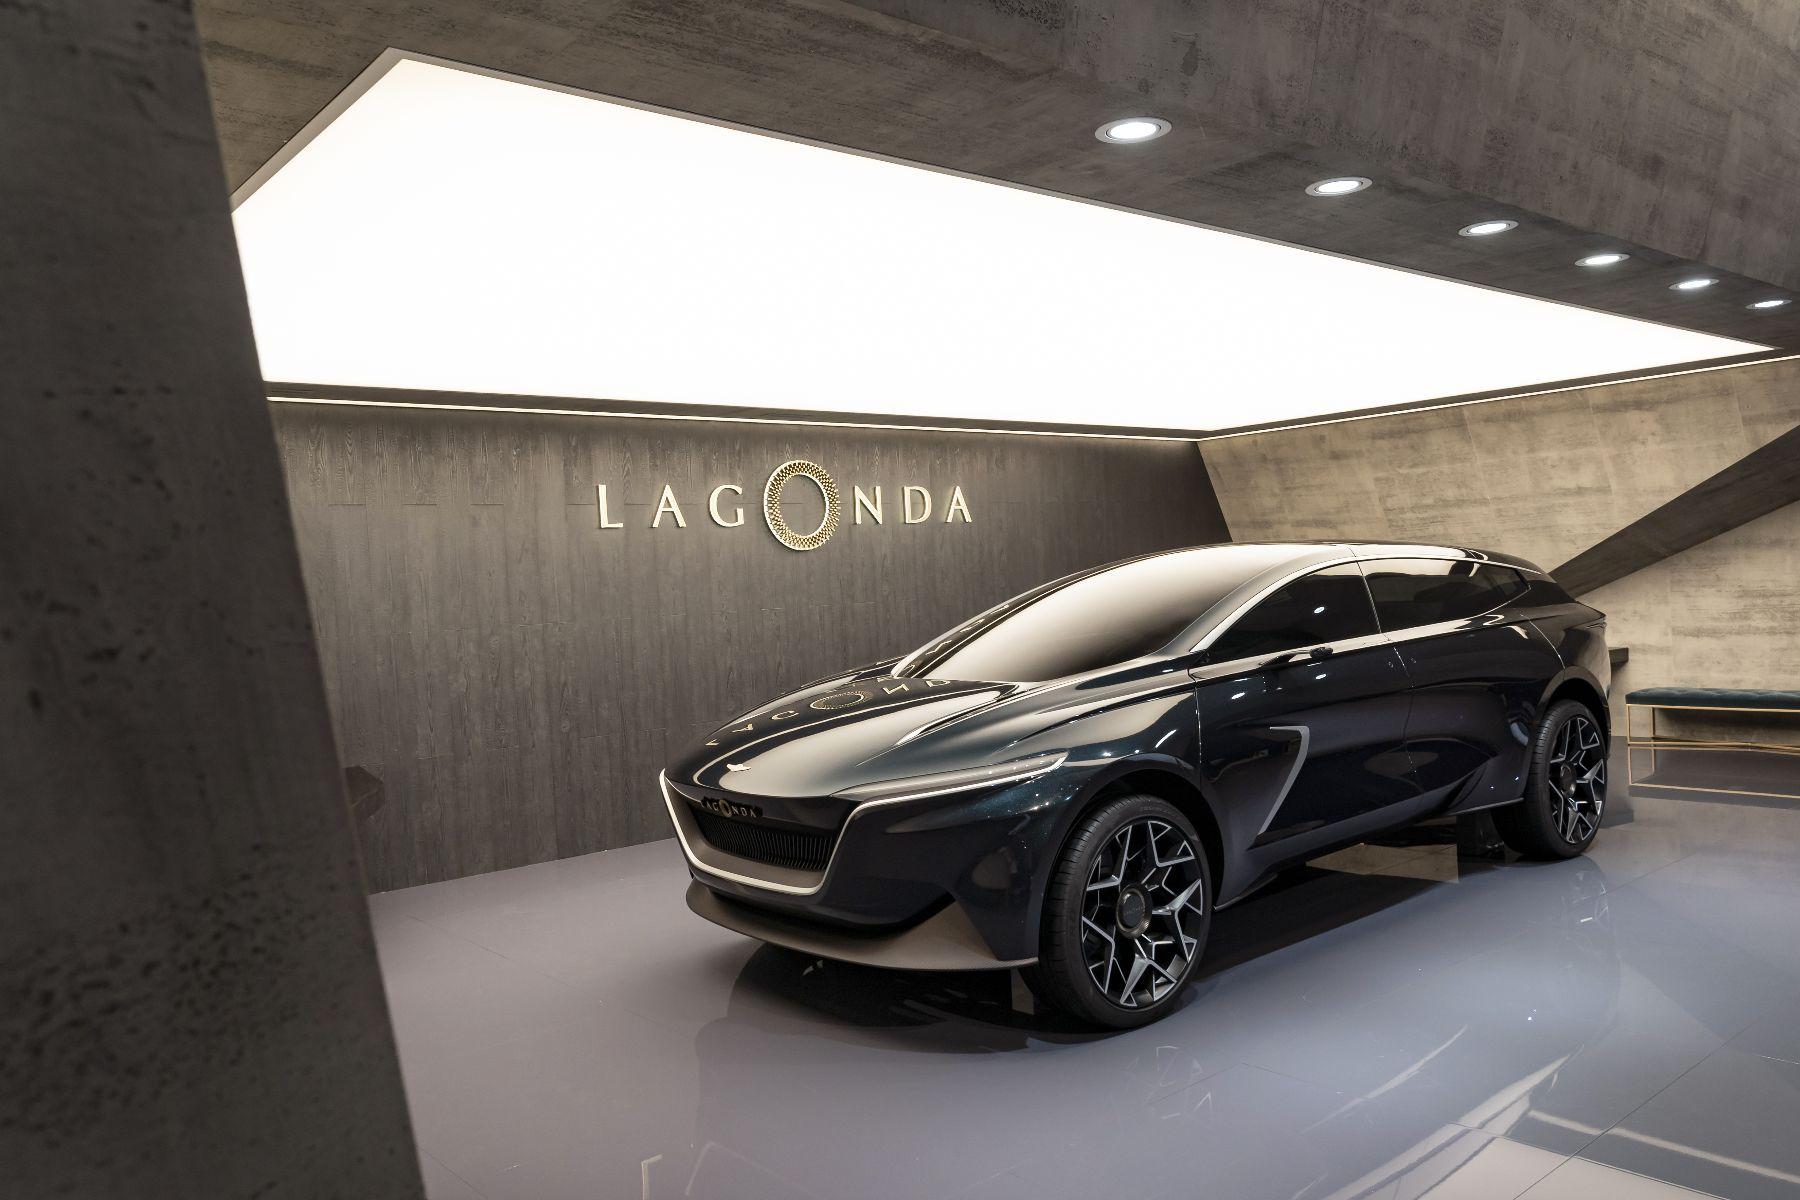 Aston Martin Lagonda All Terrain Electric Car 2020 Rumors Price Release Date Features